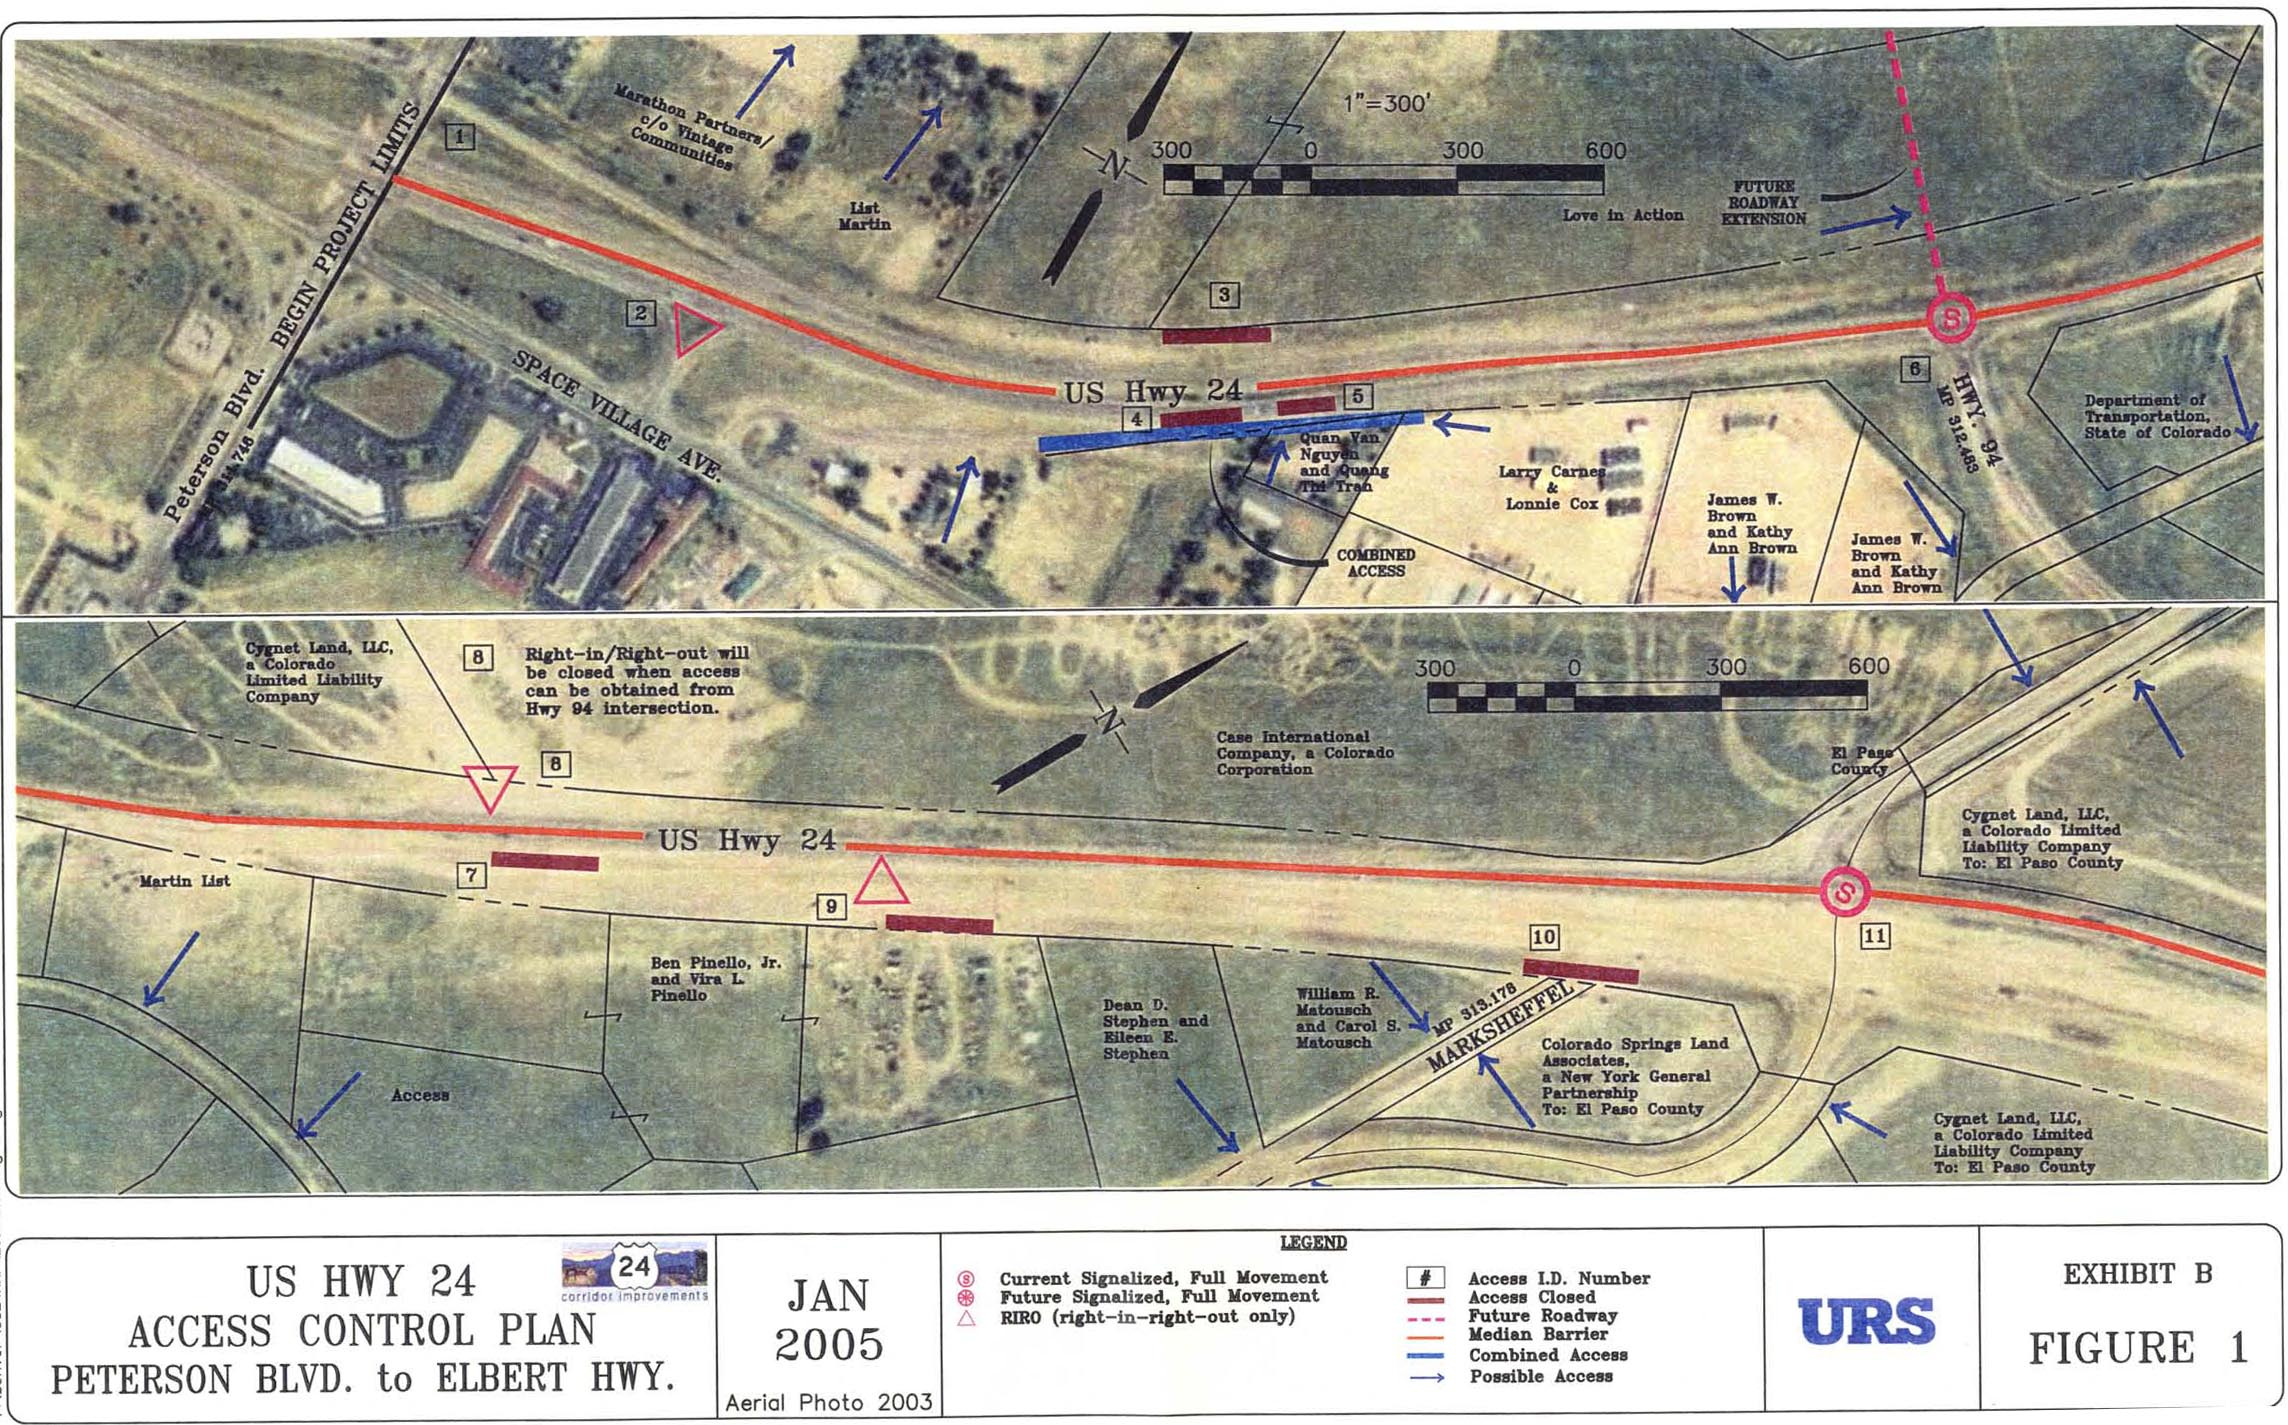 US 24 Access Control Plan 2005